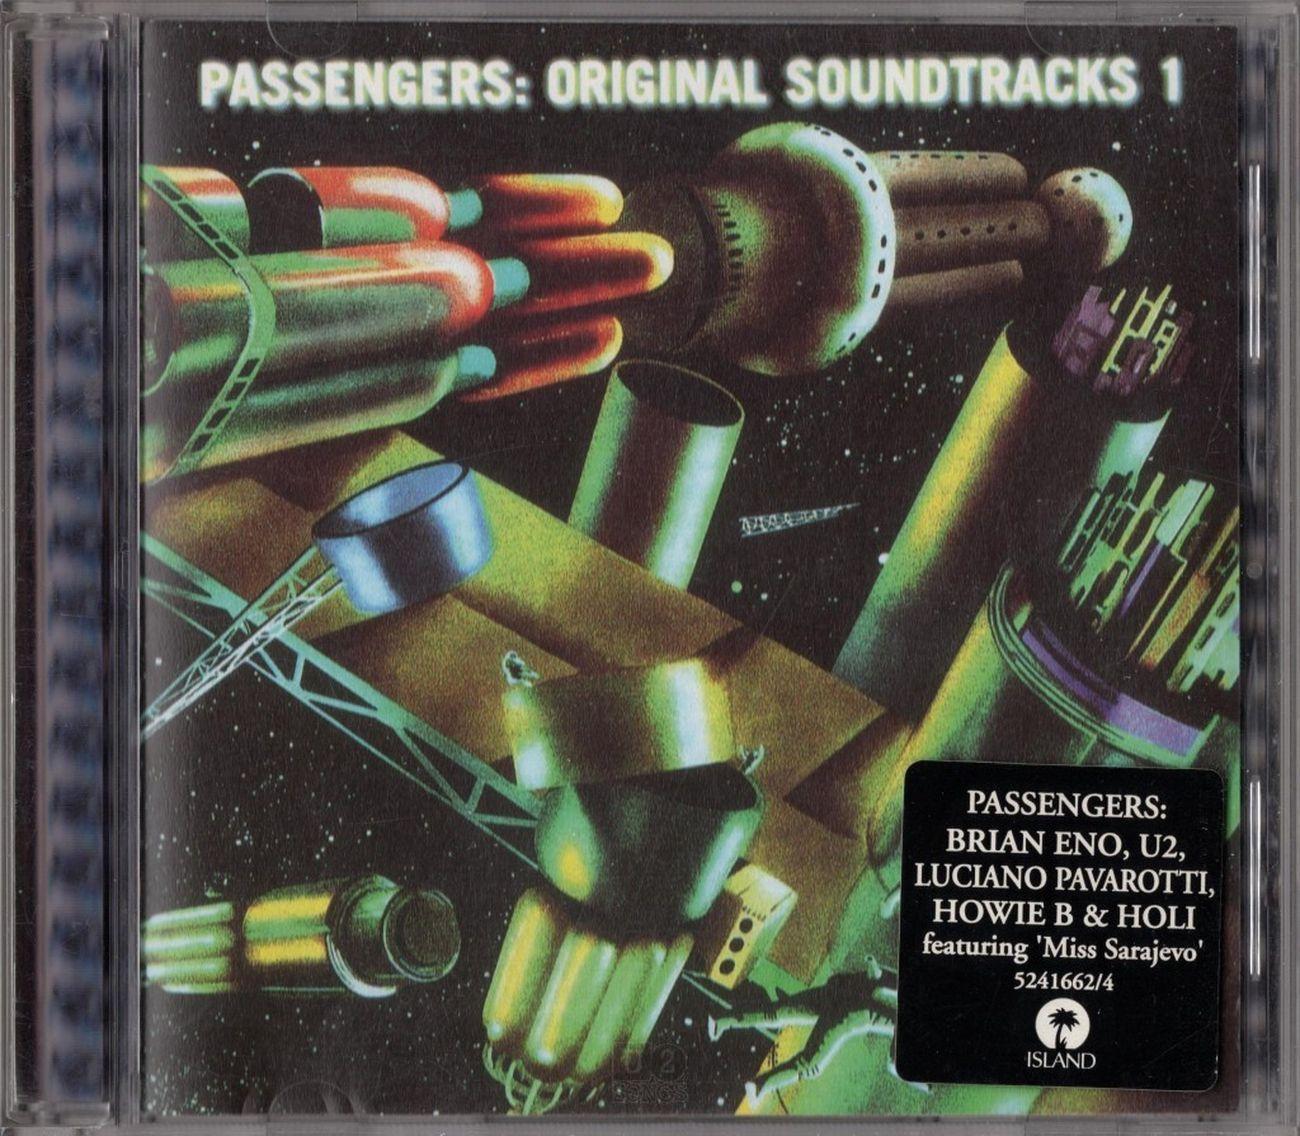 Passengers, Original Soundtracks 1 (1995). Copertina dell'album